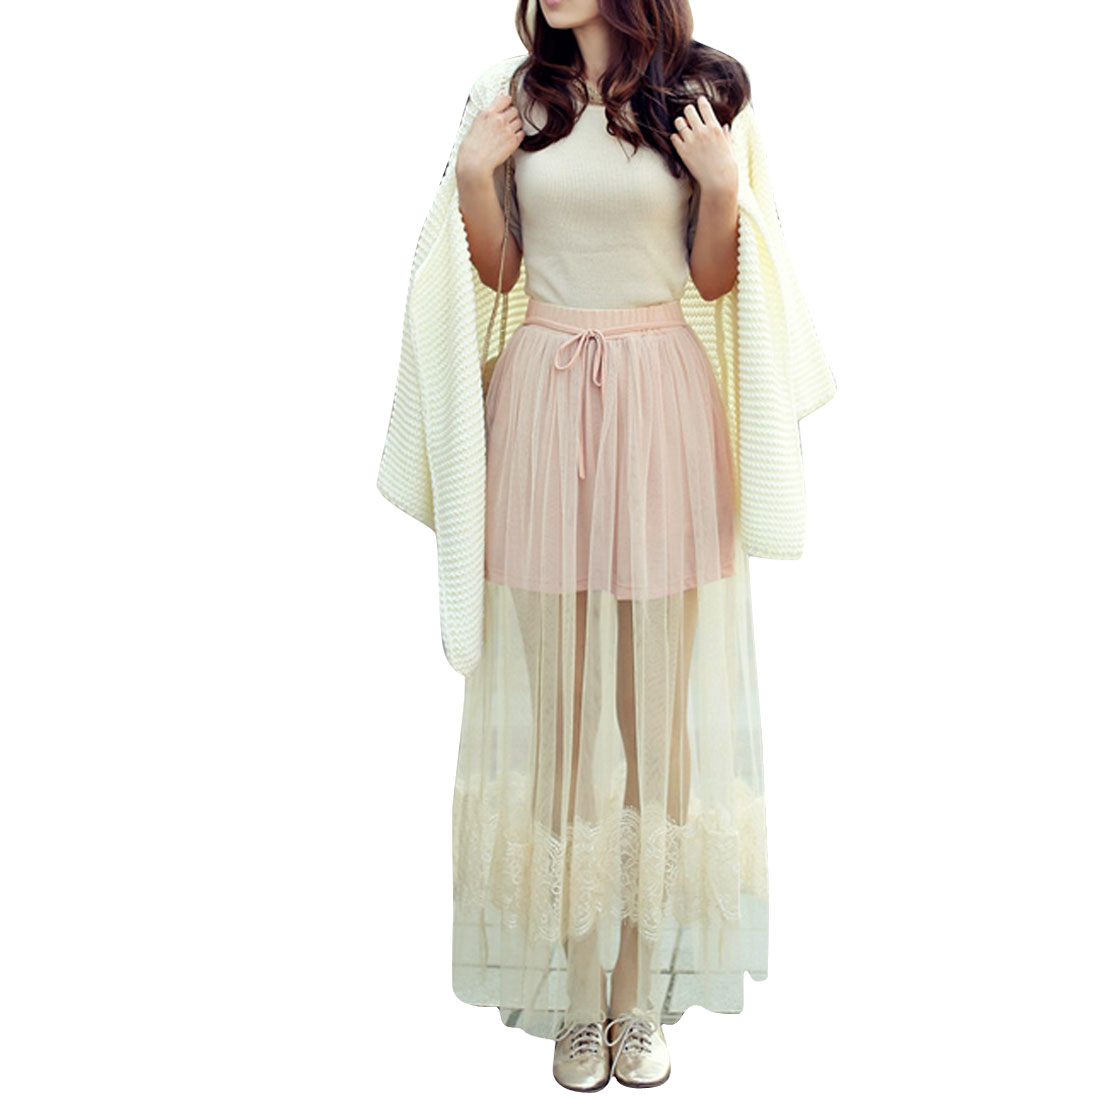 Women Drawstring Elastic Waist Lace Detail Mesh Skirt Pink Beige XS